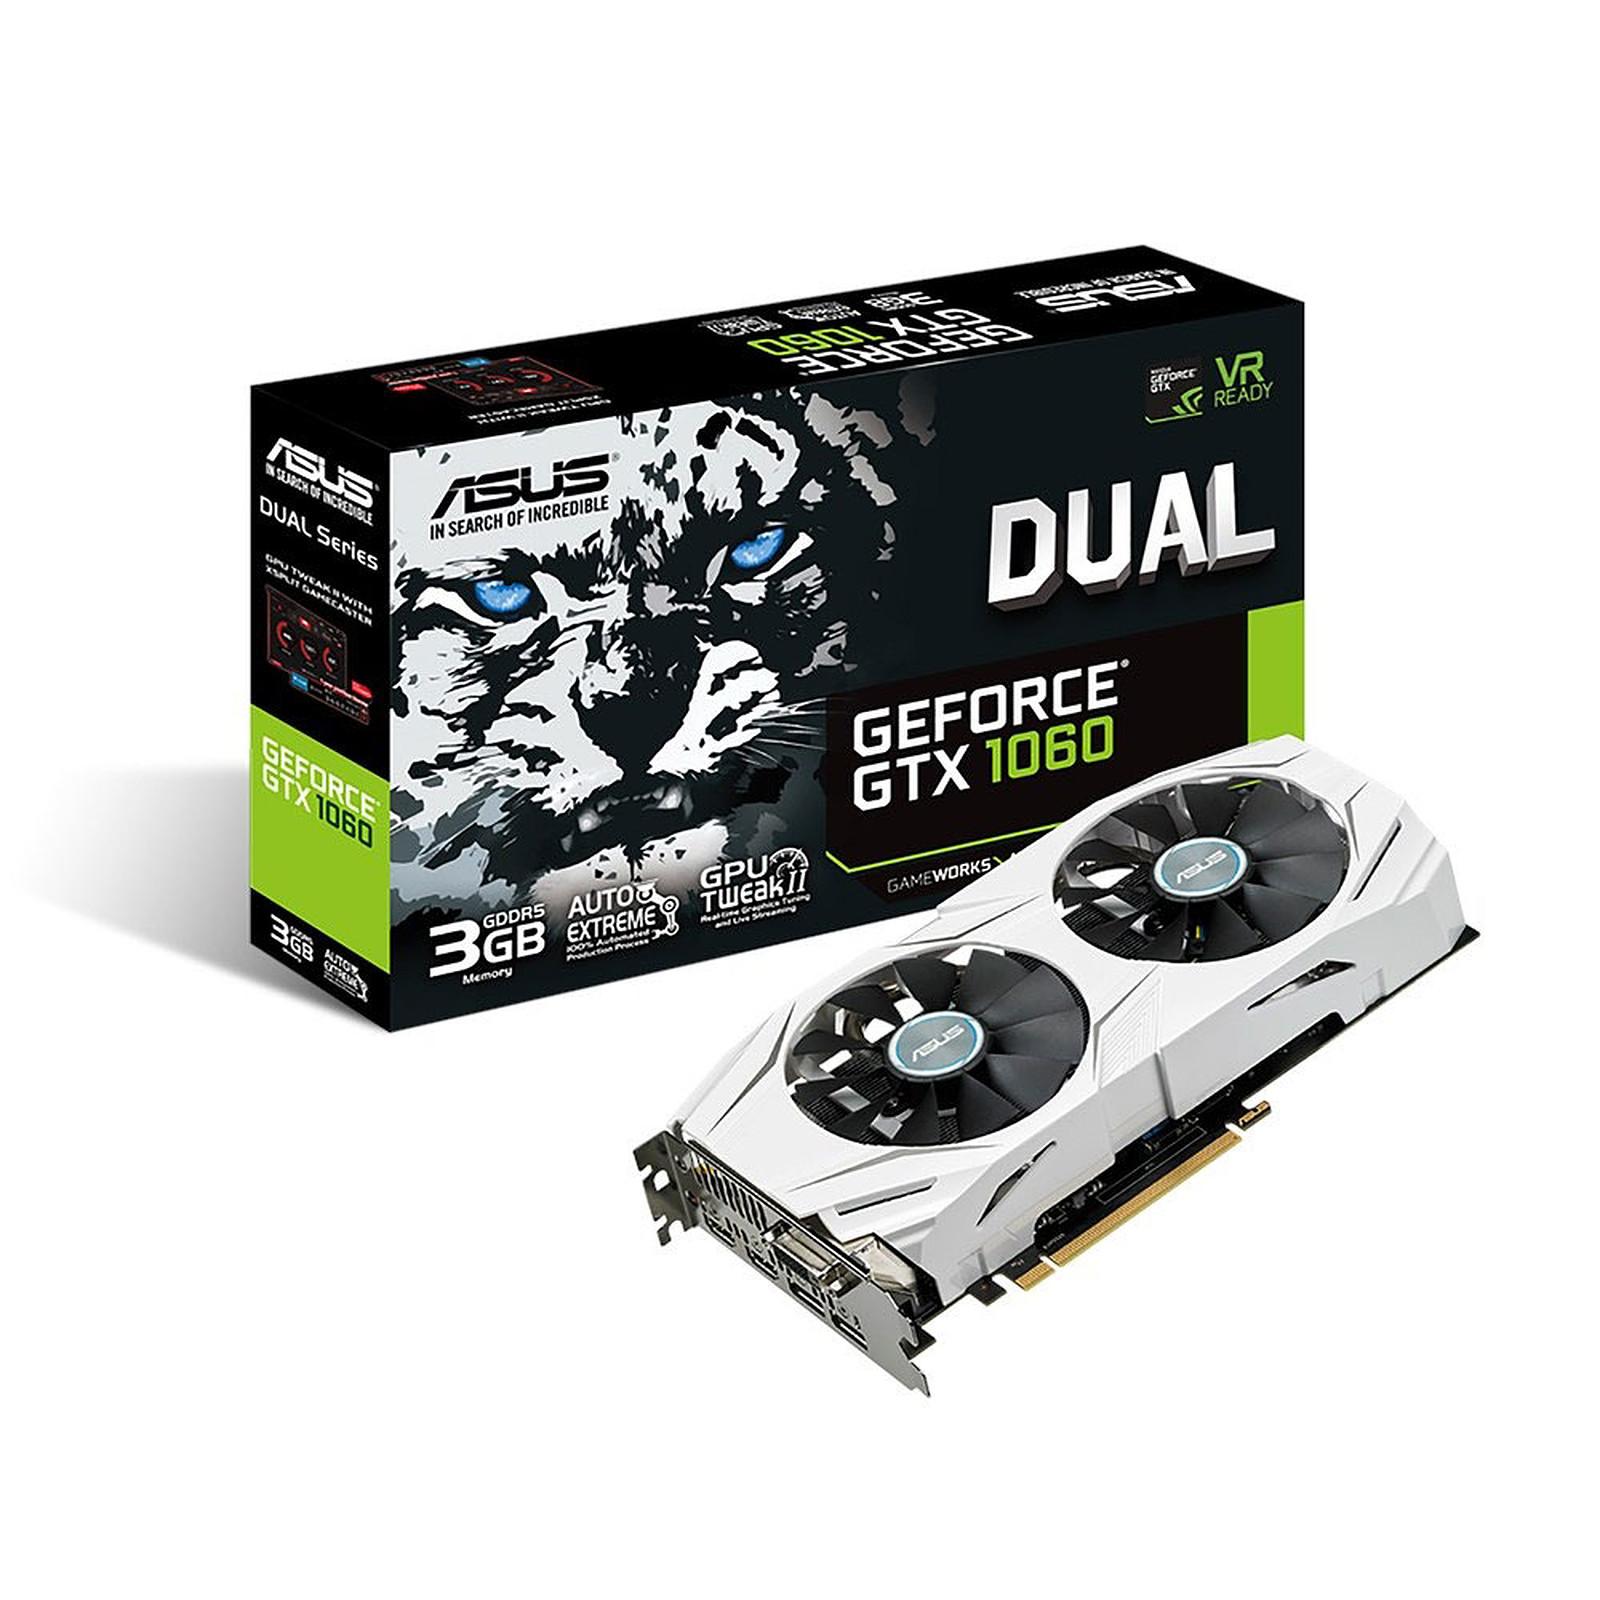 ASUS GeForce GTX 1060 Edition DUAL-GTX1060-3G